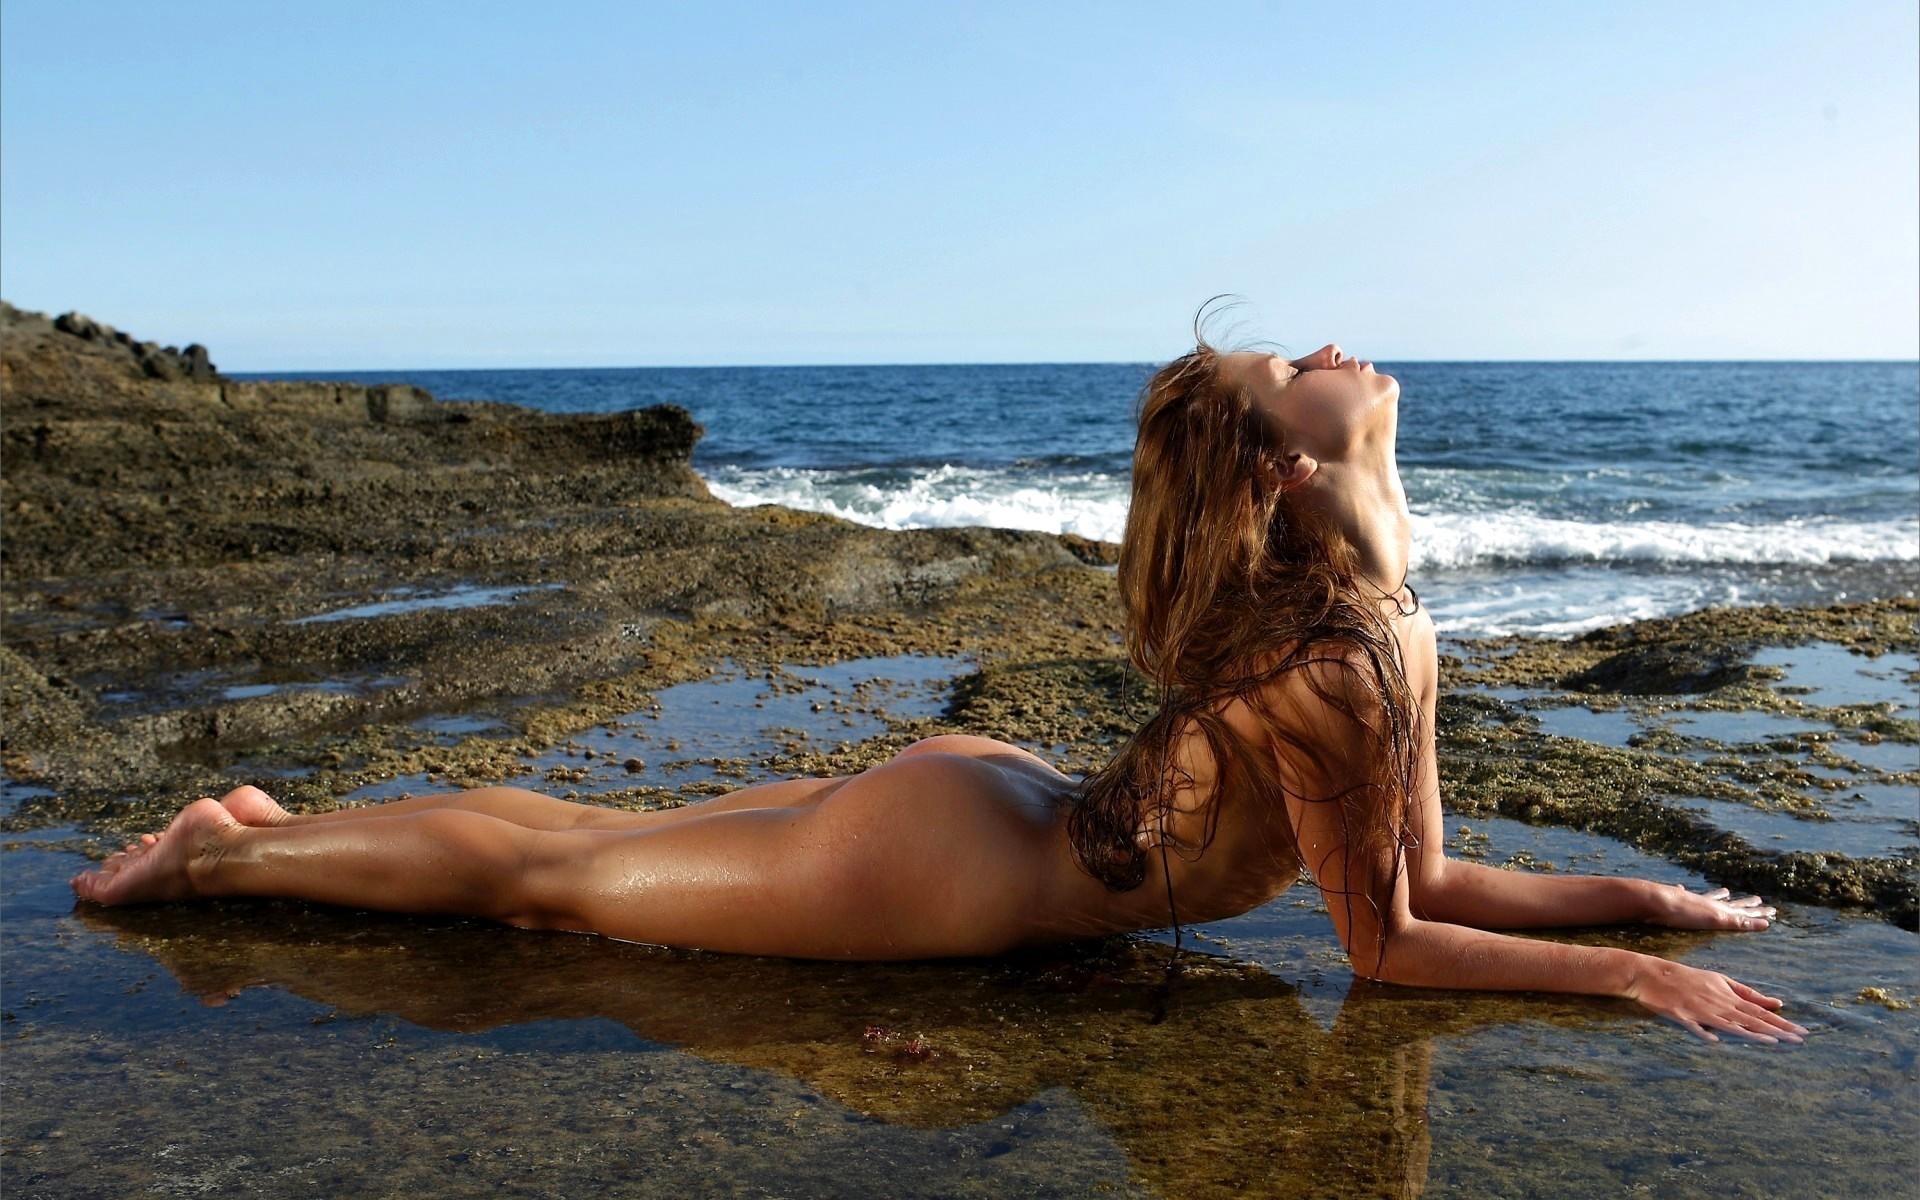 trusiki-ulitse-erotichnie-foto-krasivih-devushek-na-beregu-morya